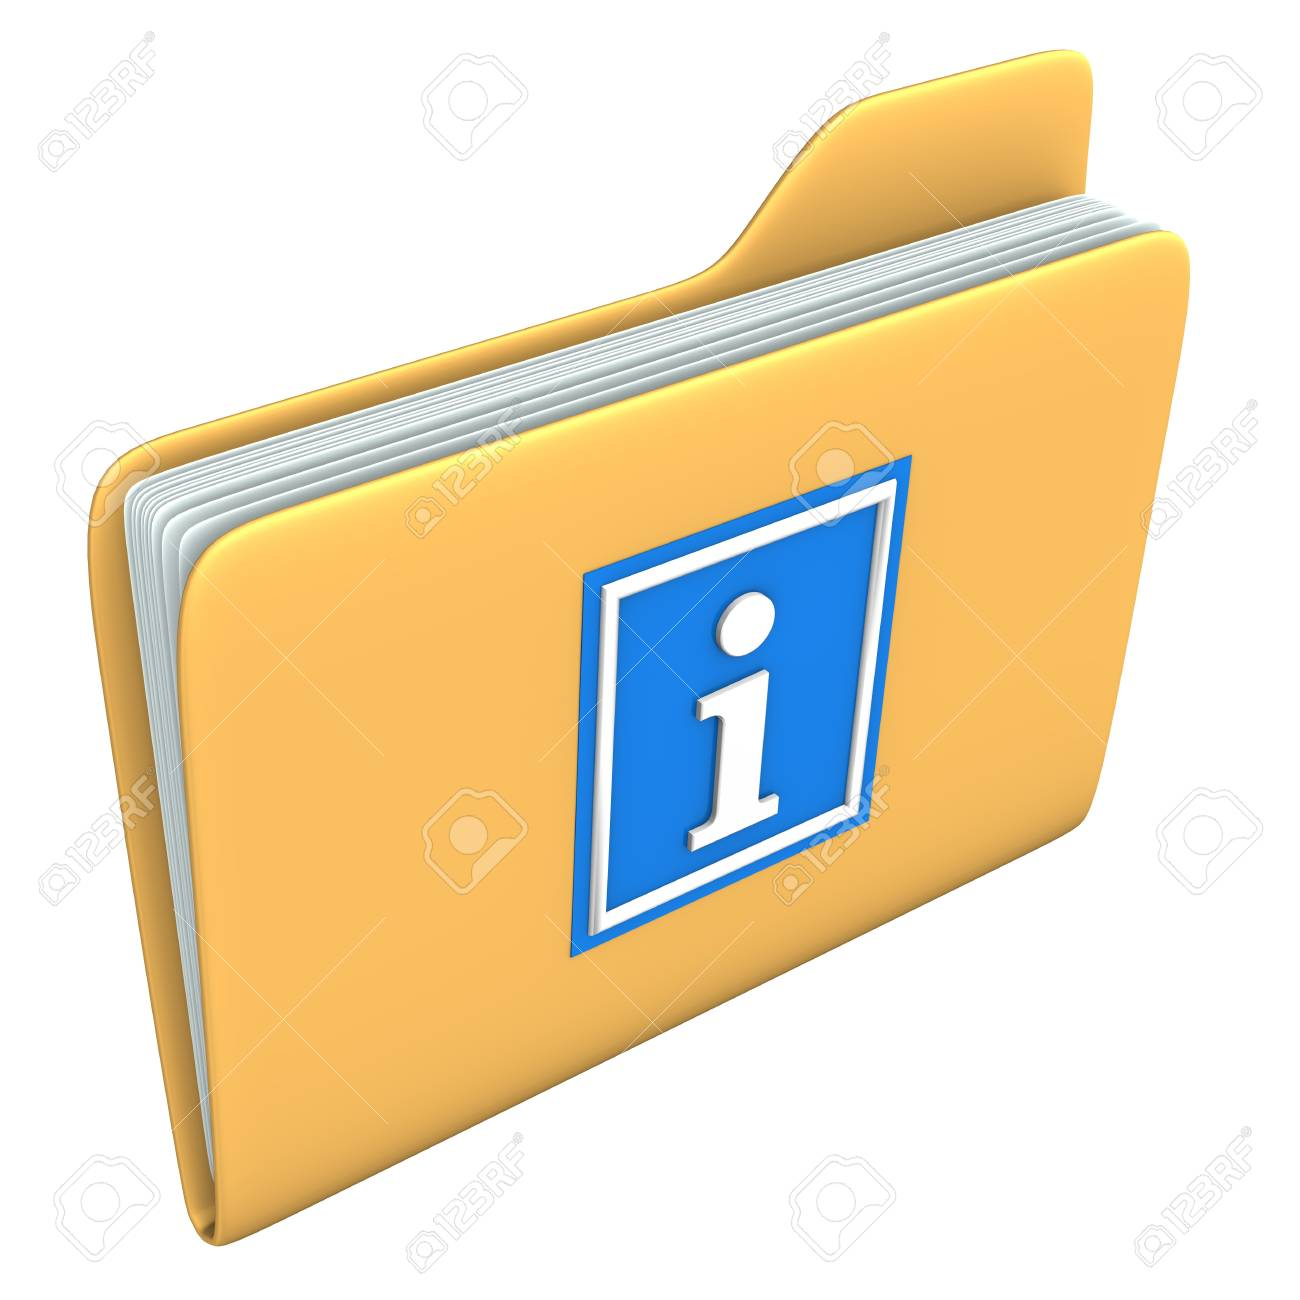 Yellow folder with blue information symbol on the white backround Stock Photo - 15234443